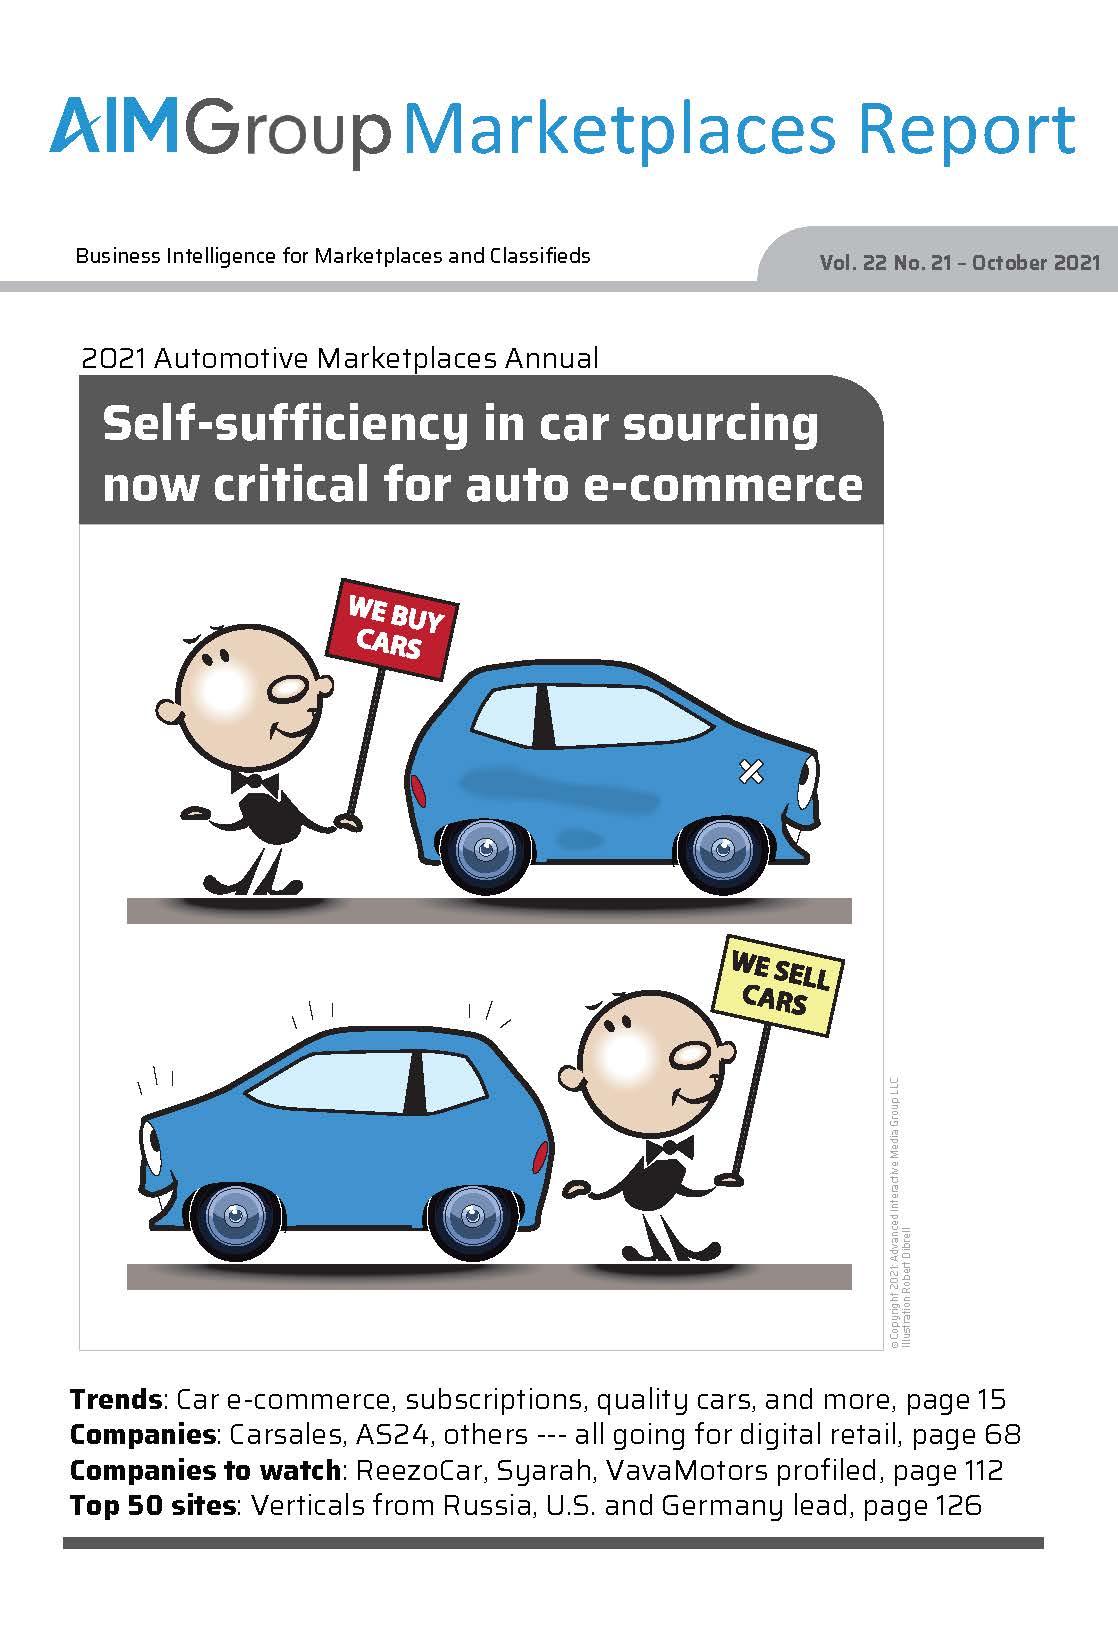 2021 Automotive Marketplaces Annual